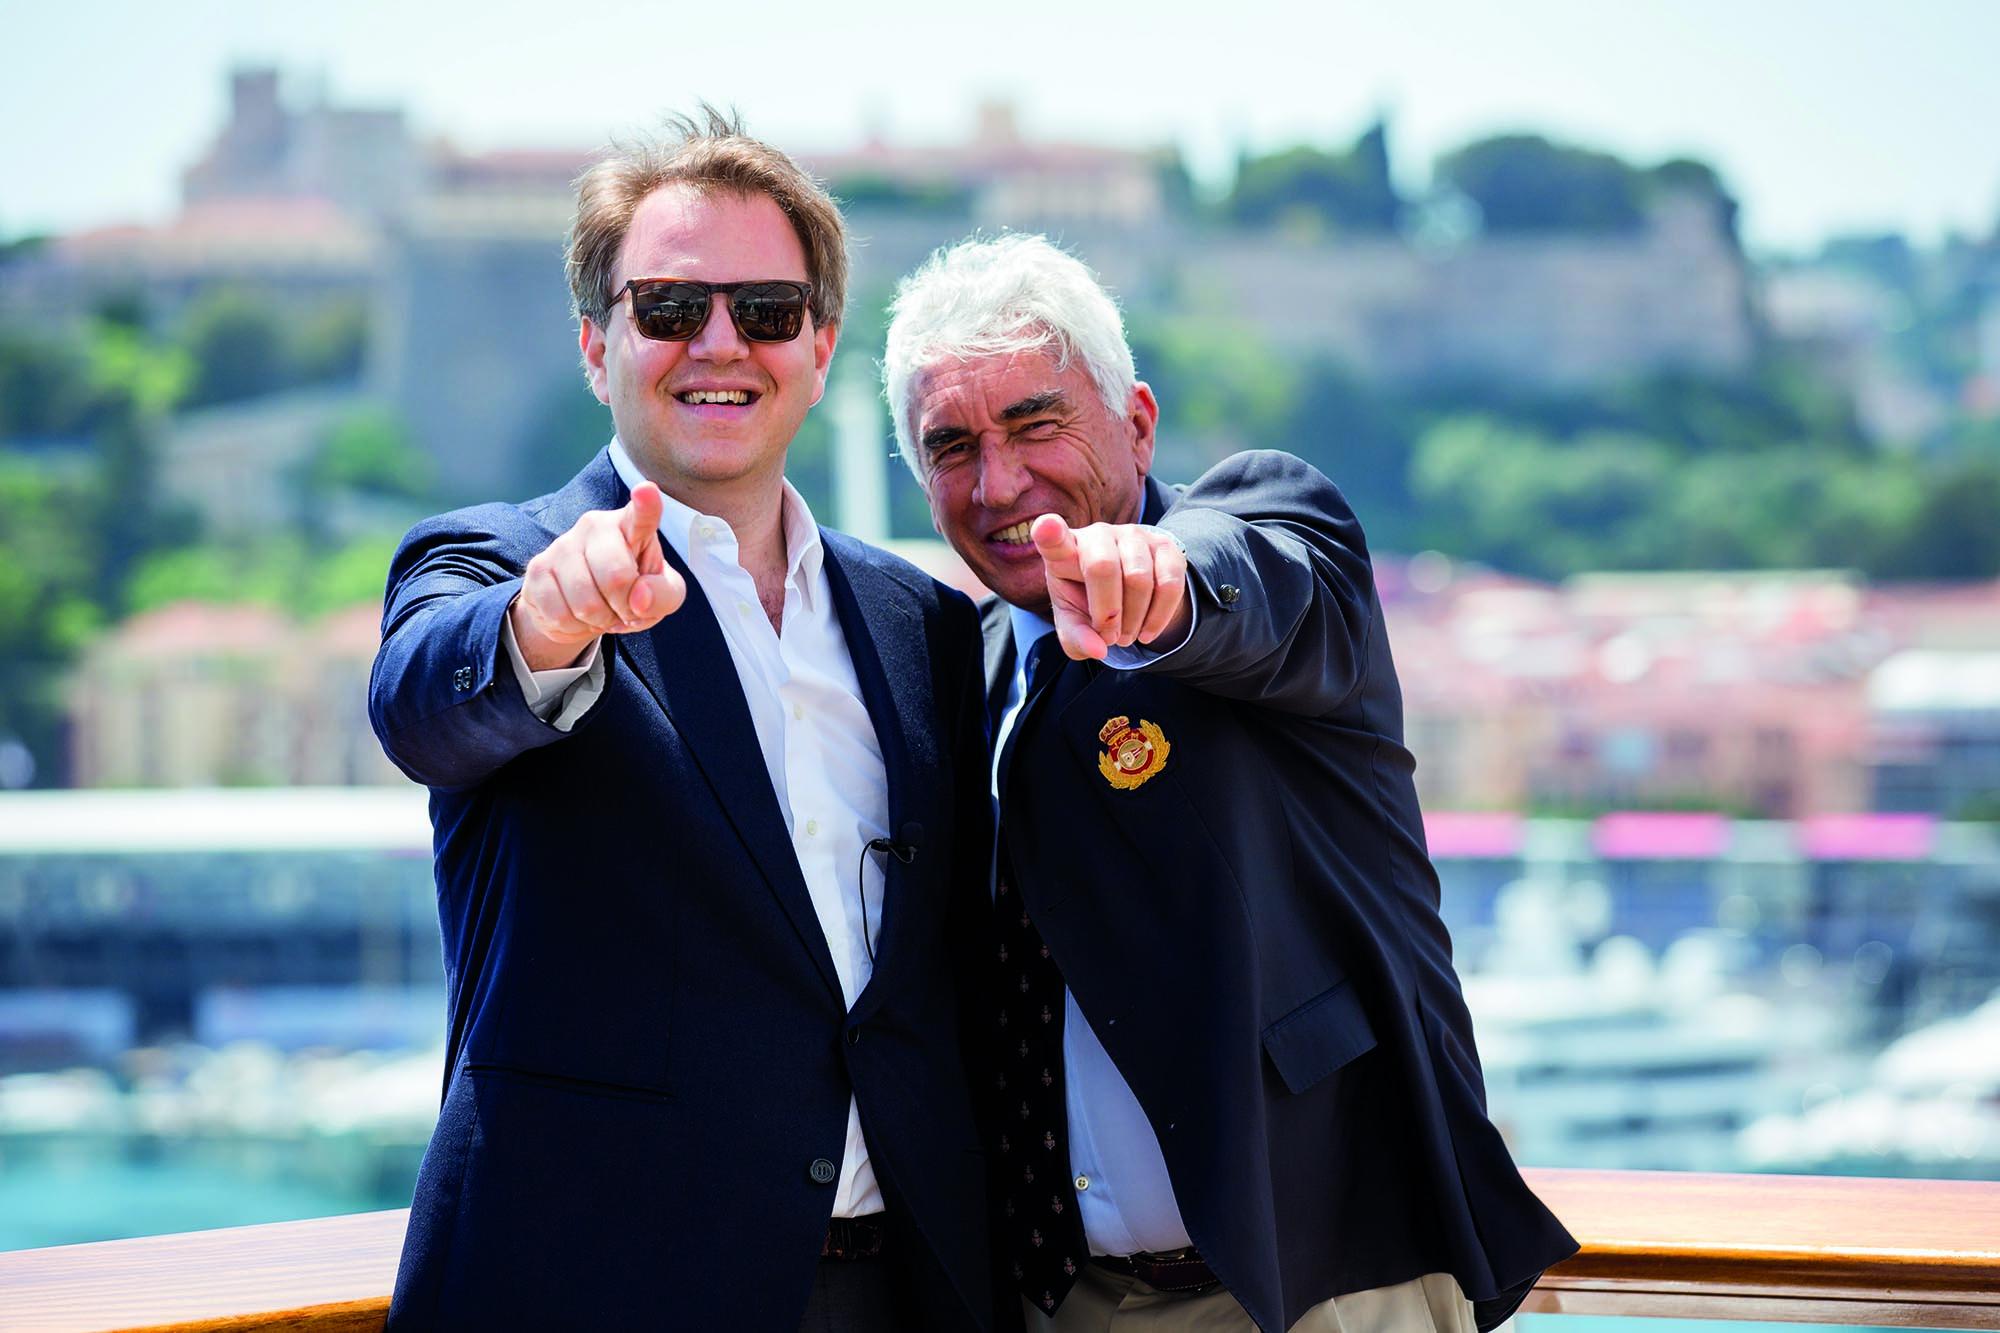 Philippe Ghanem & Bernard d'Alessandri